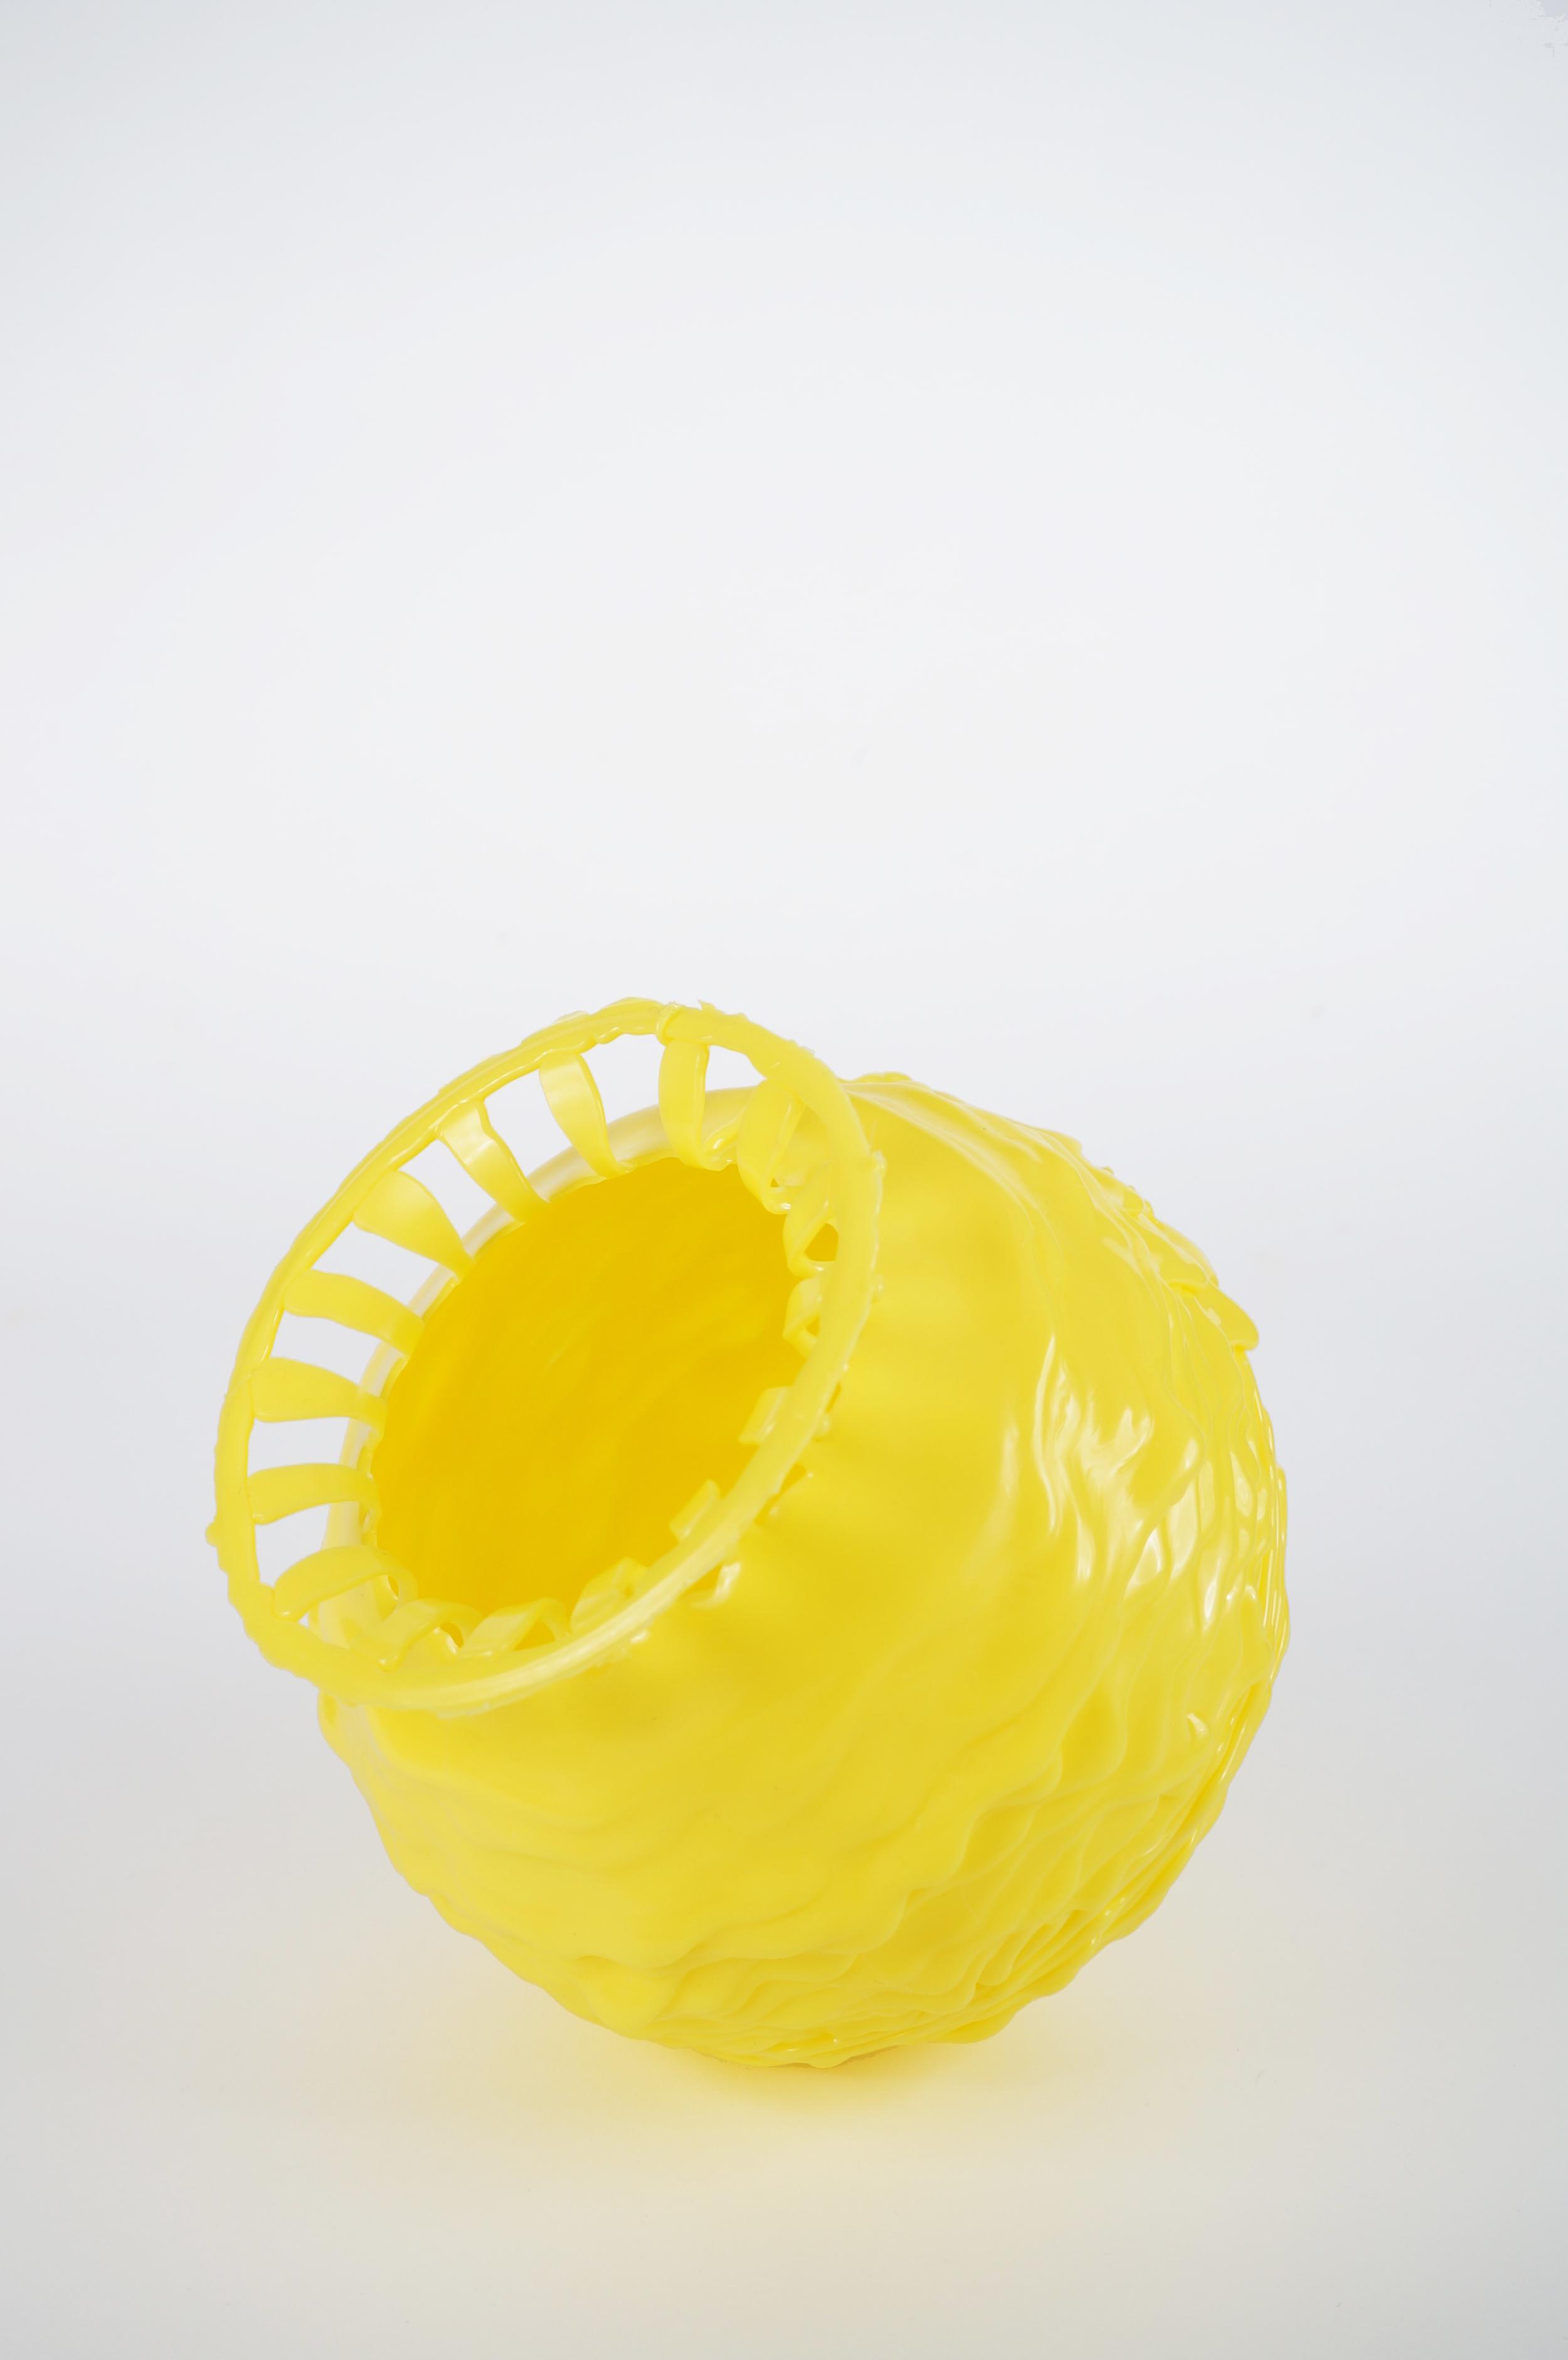 YellowBloomSide.jpg